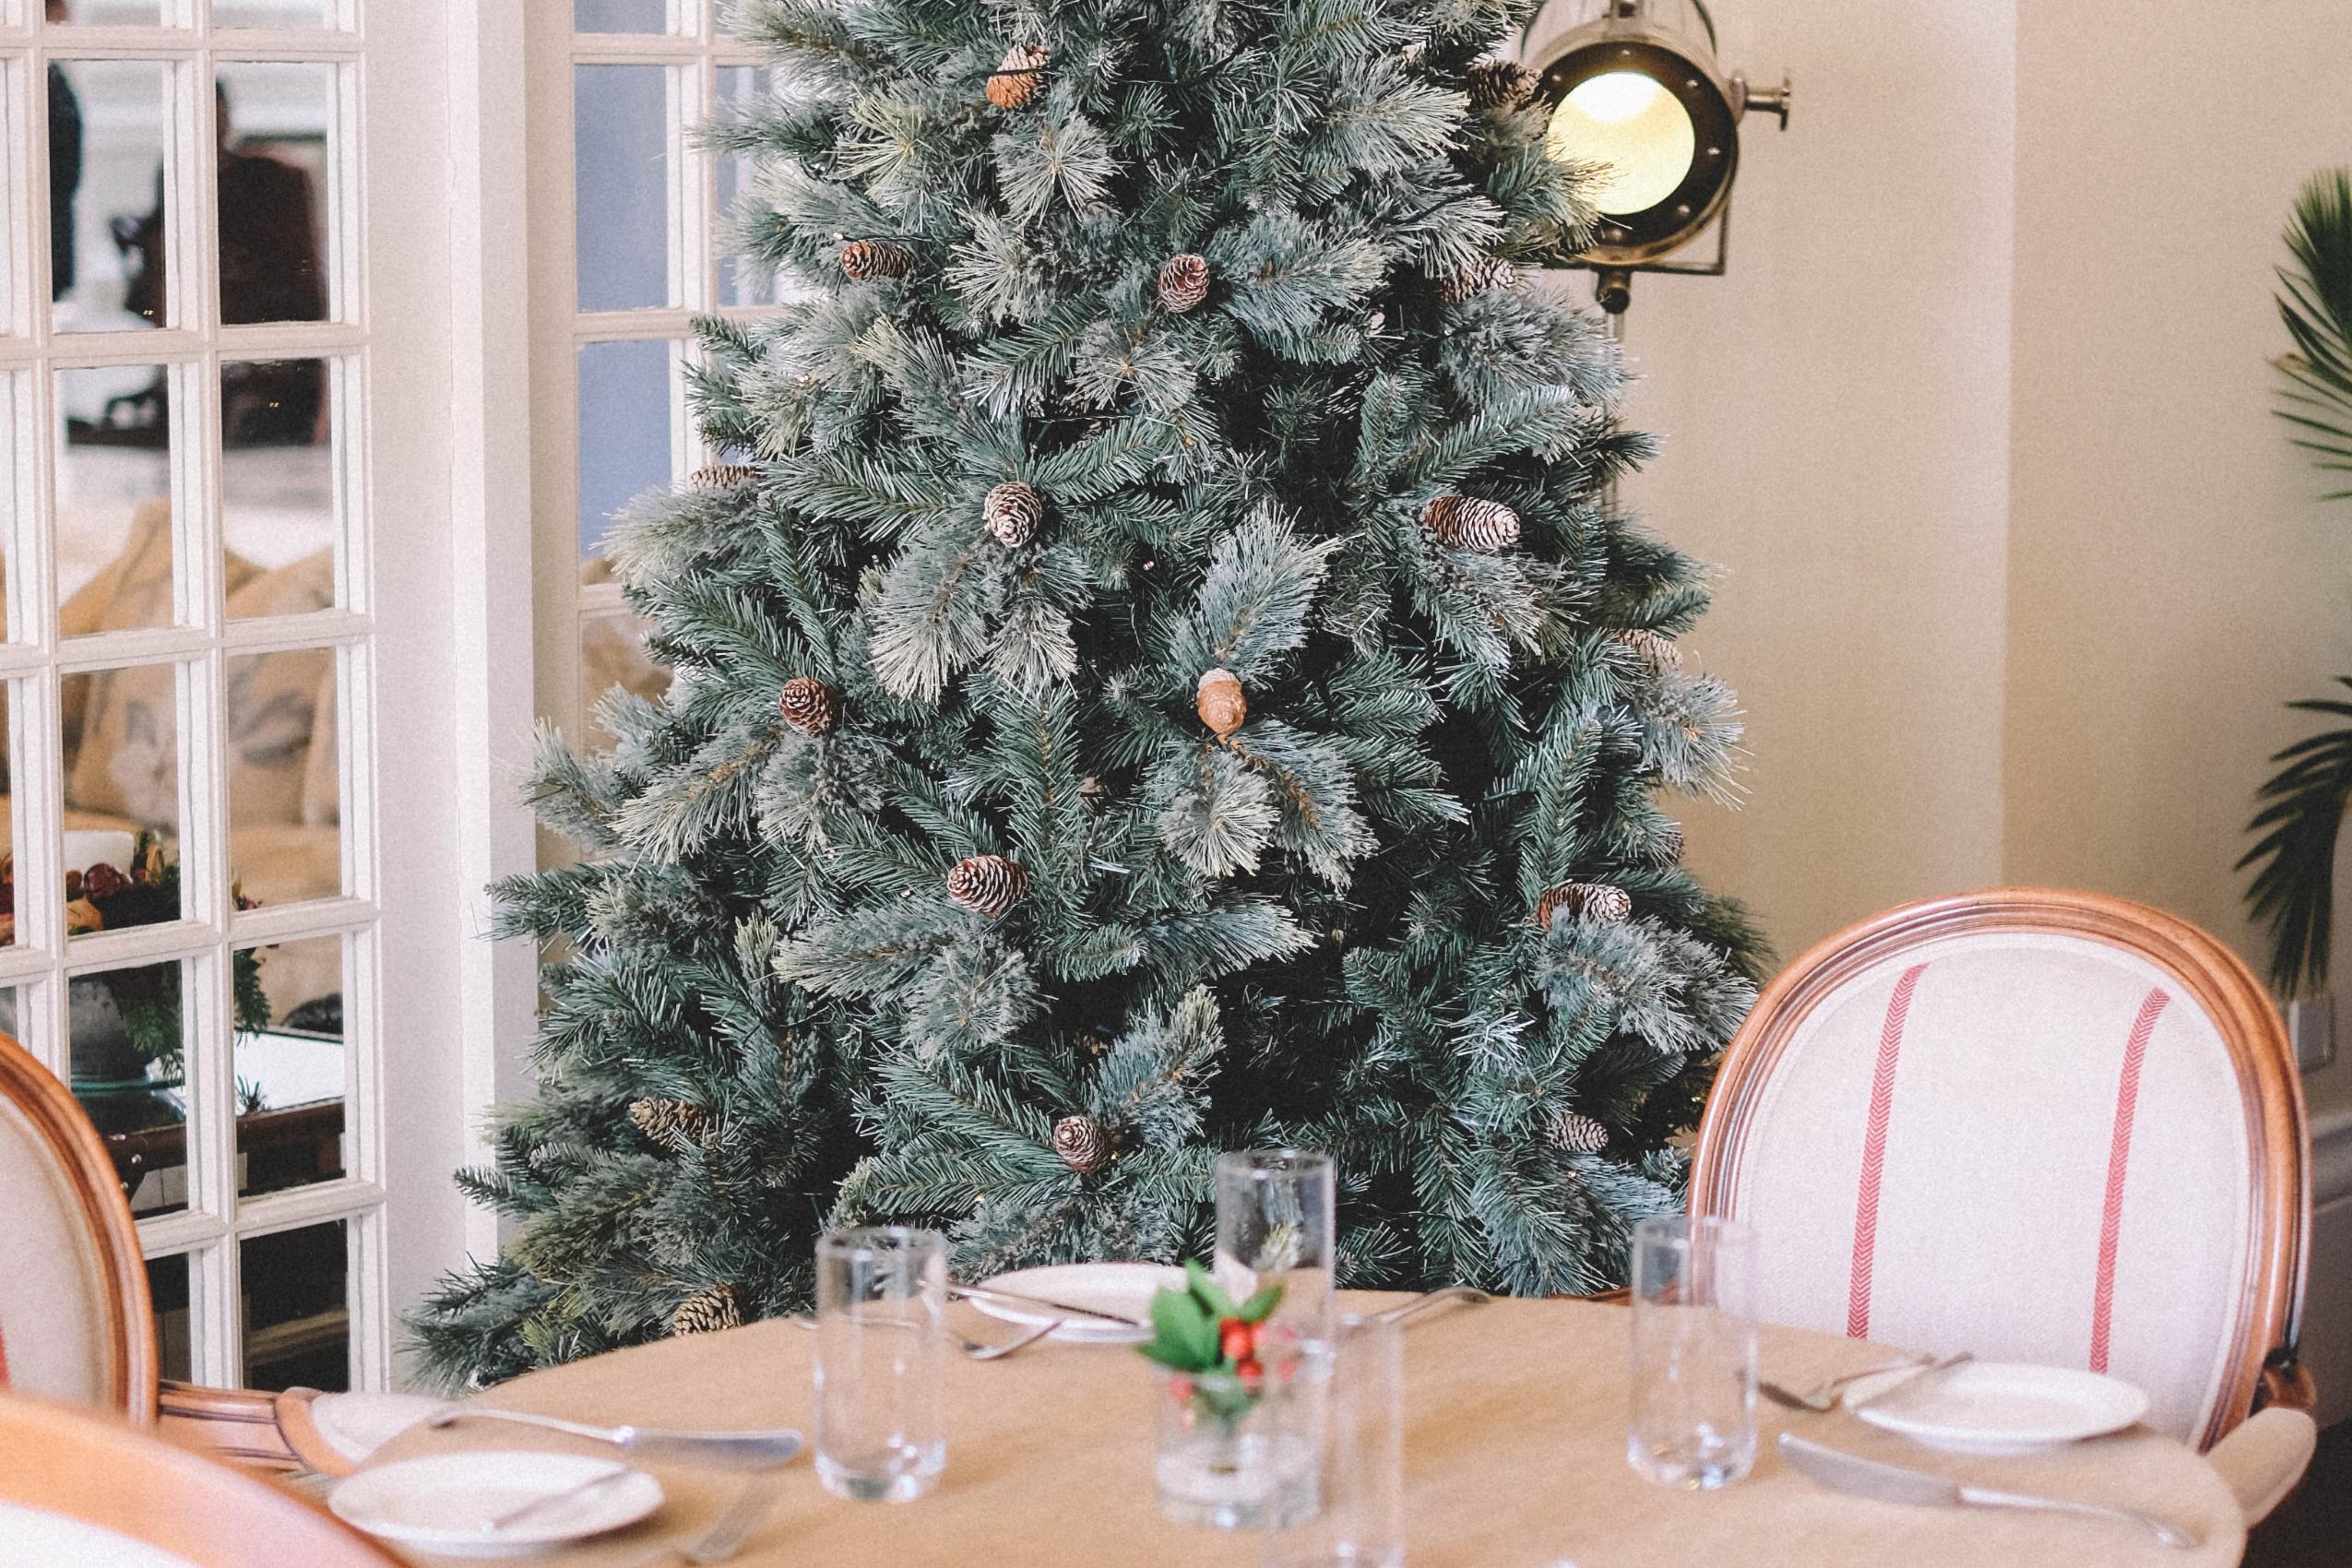 Easy and Stylish Holiday Decorating Ideas